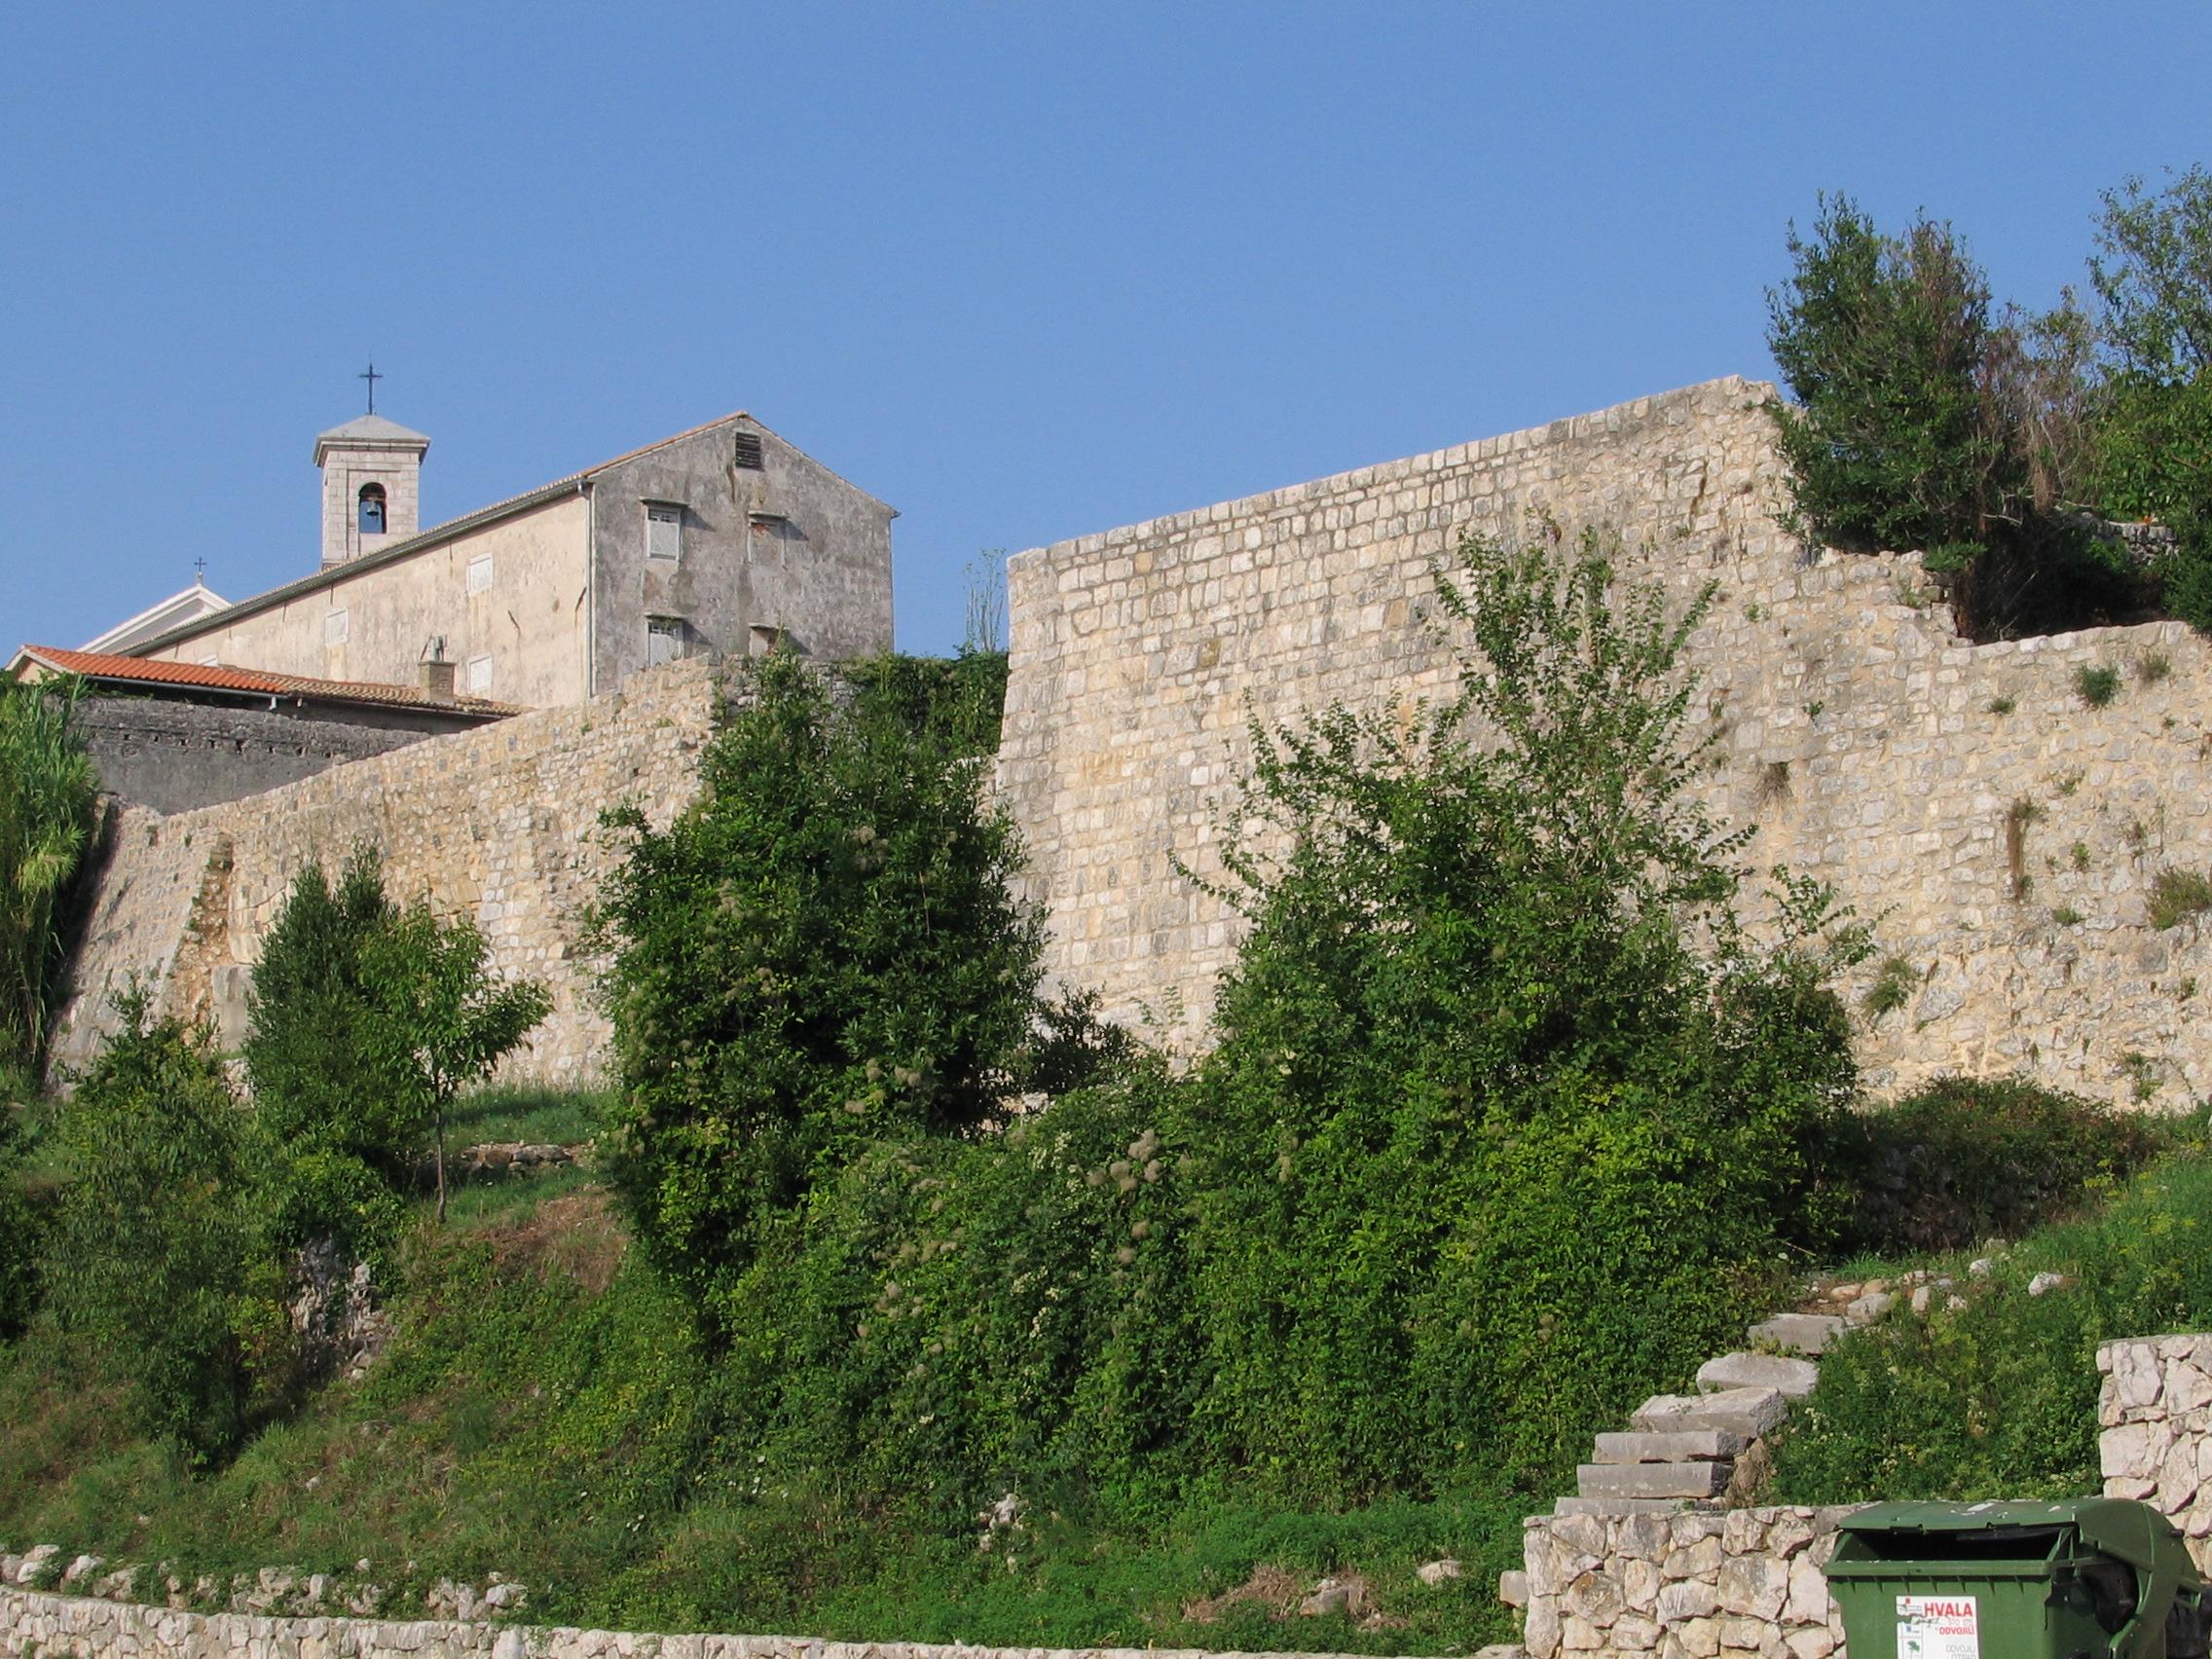 Krk città: le mura